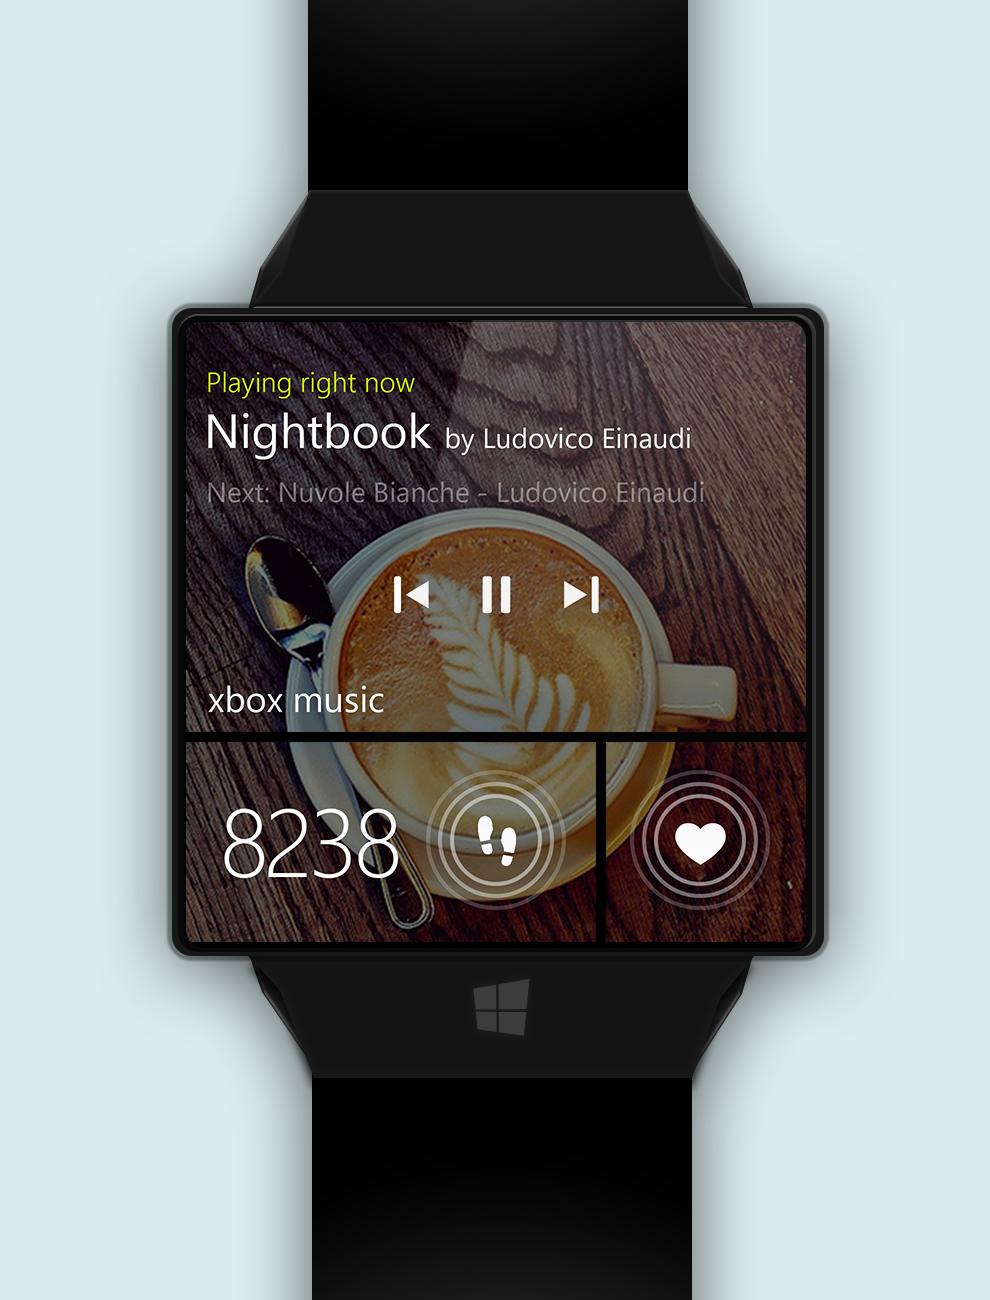 Windows_watch_music_heartbeat_step_tracker